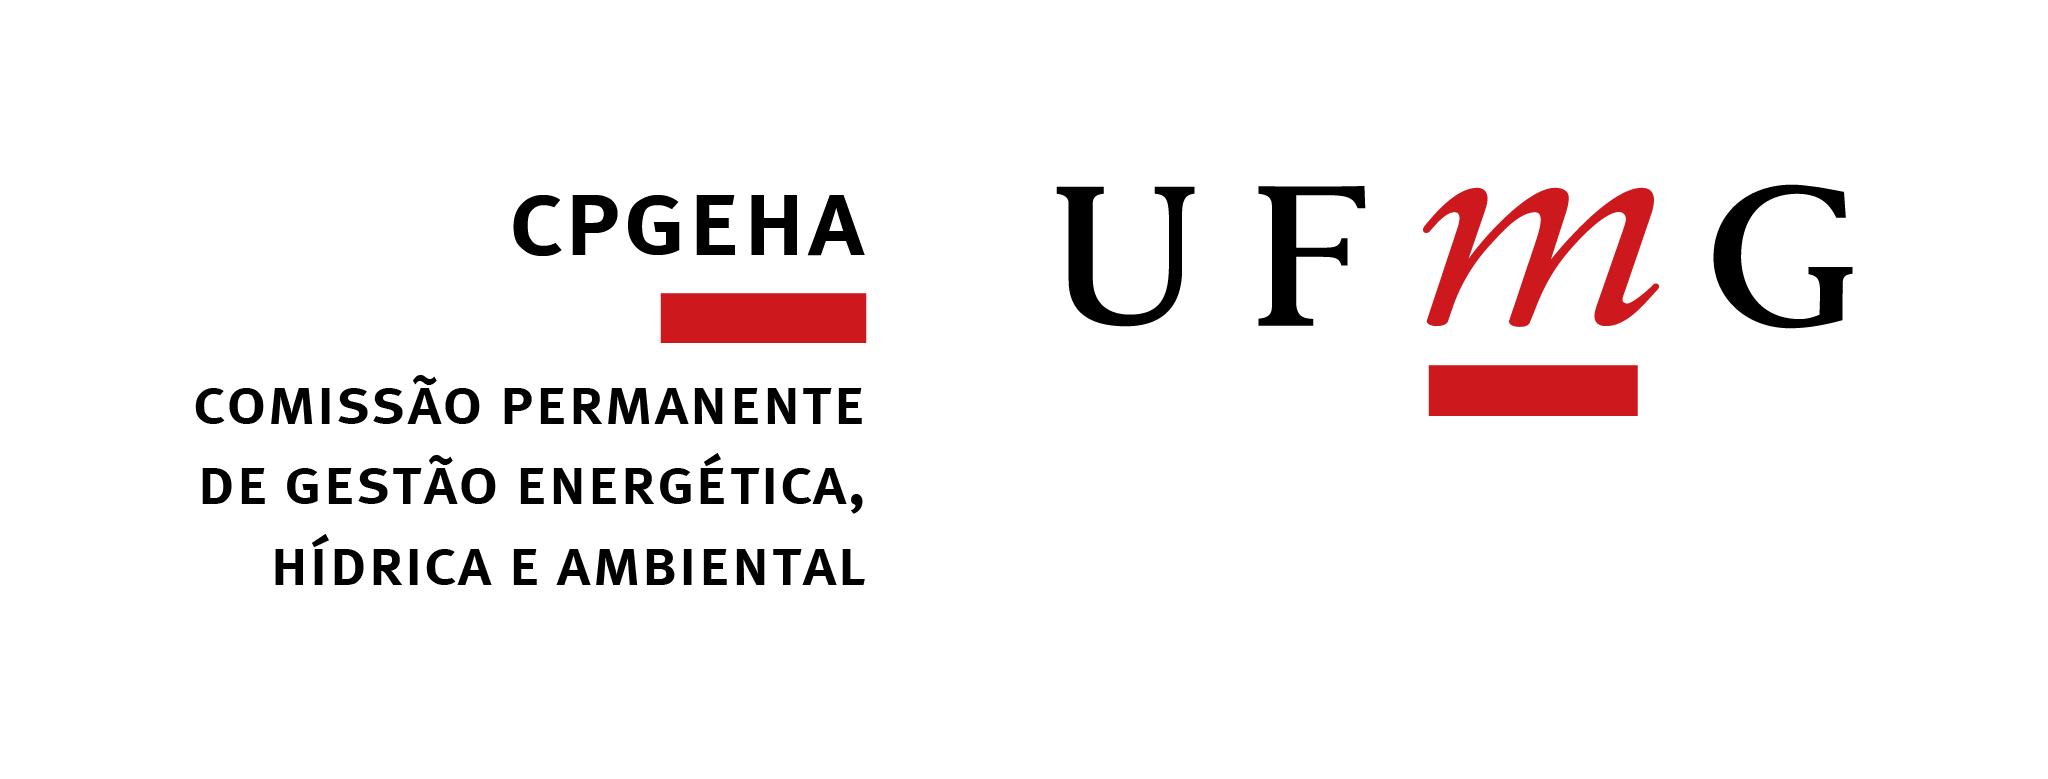 Assinatura CPGEHA